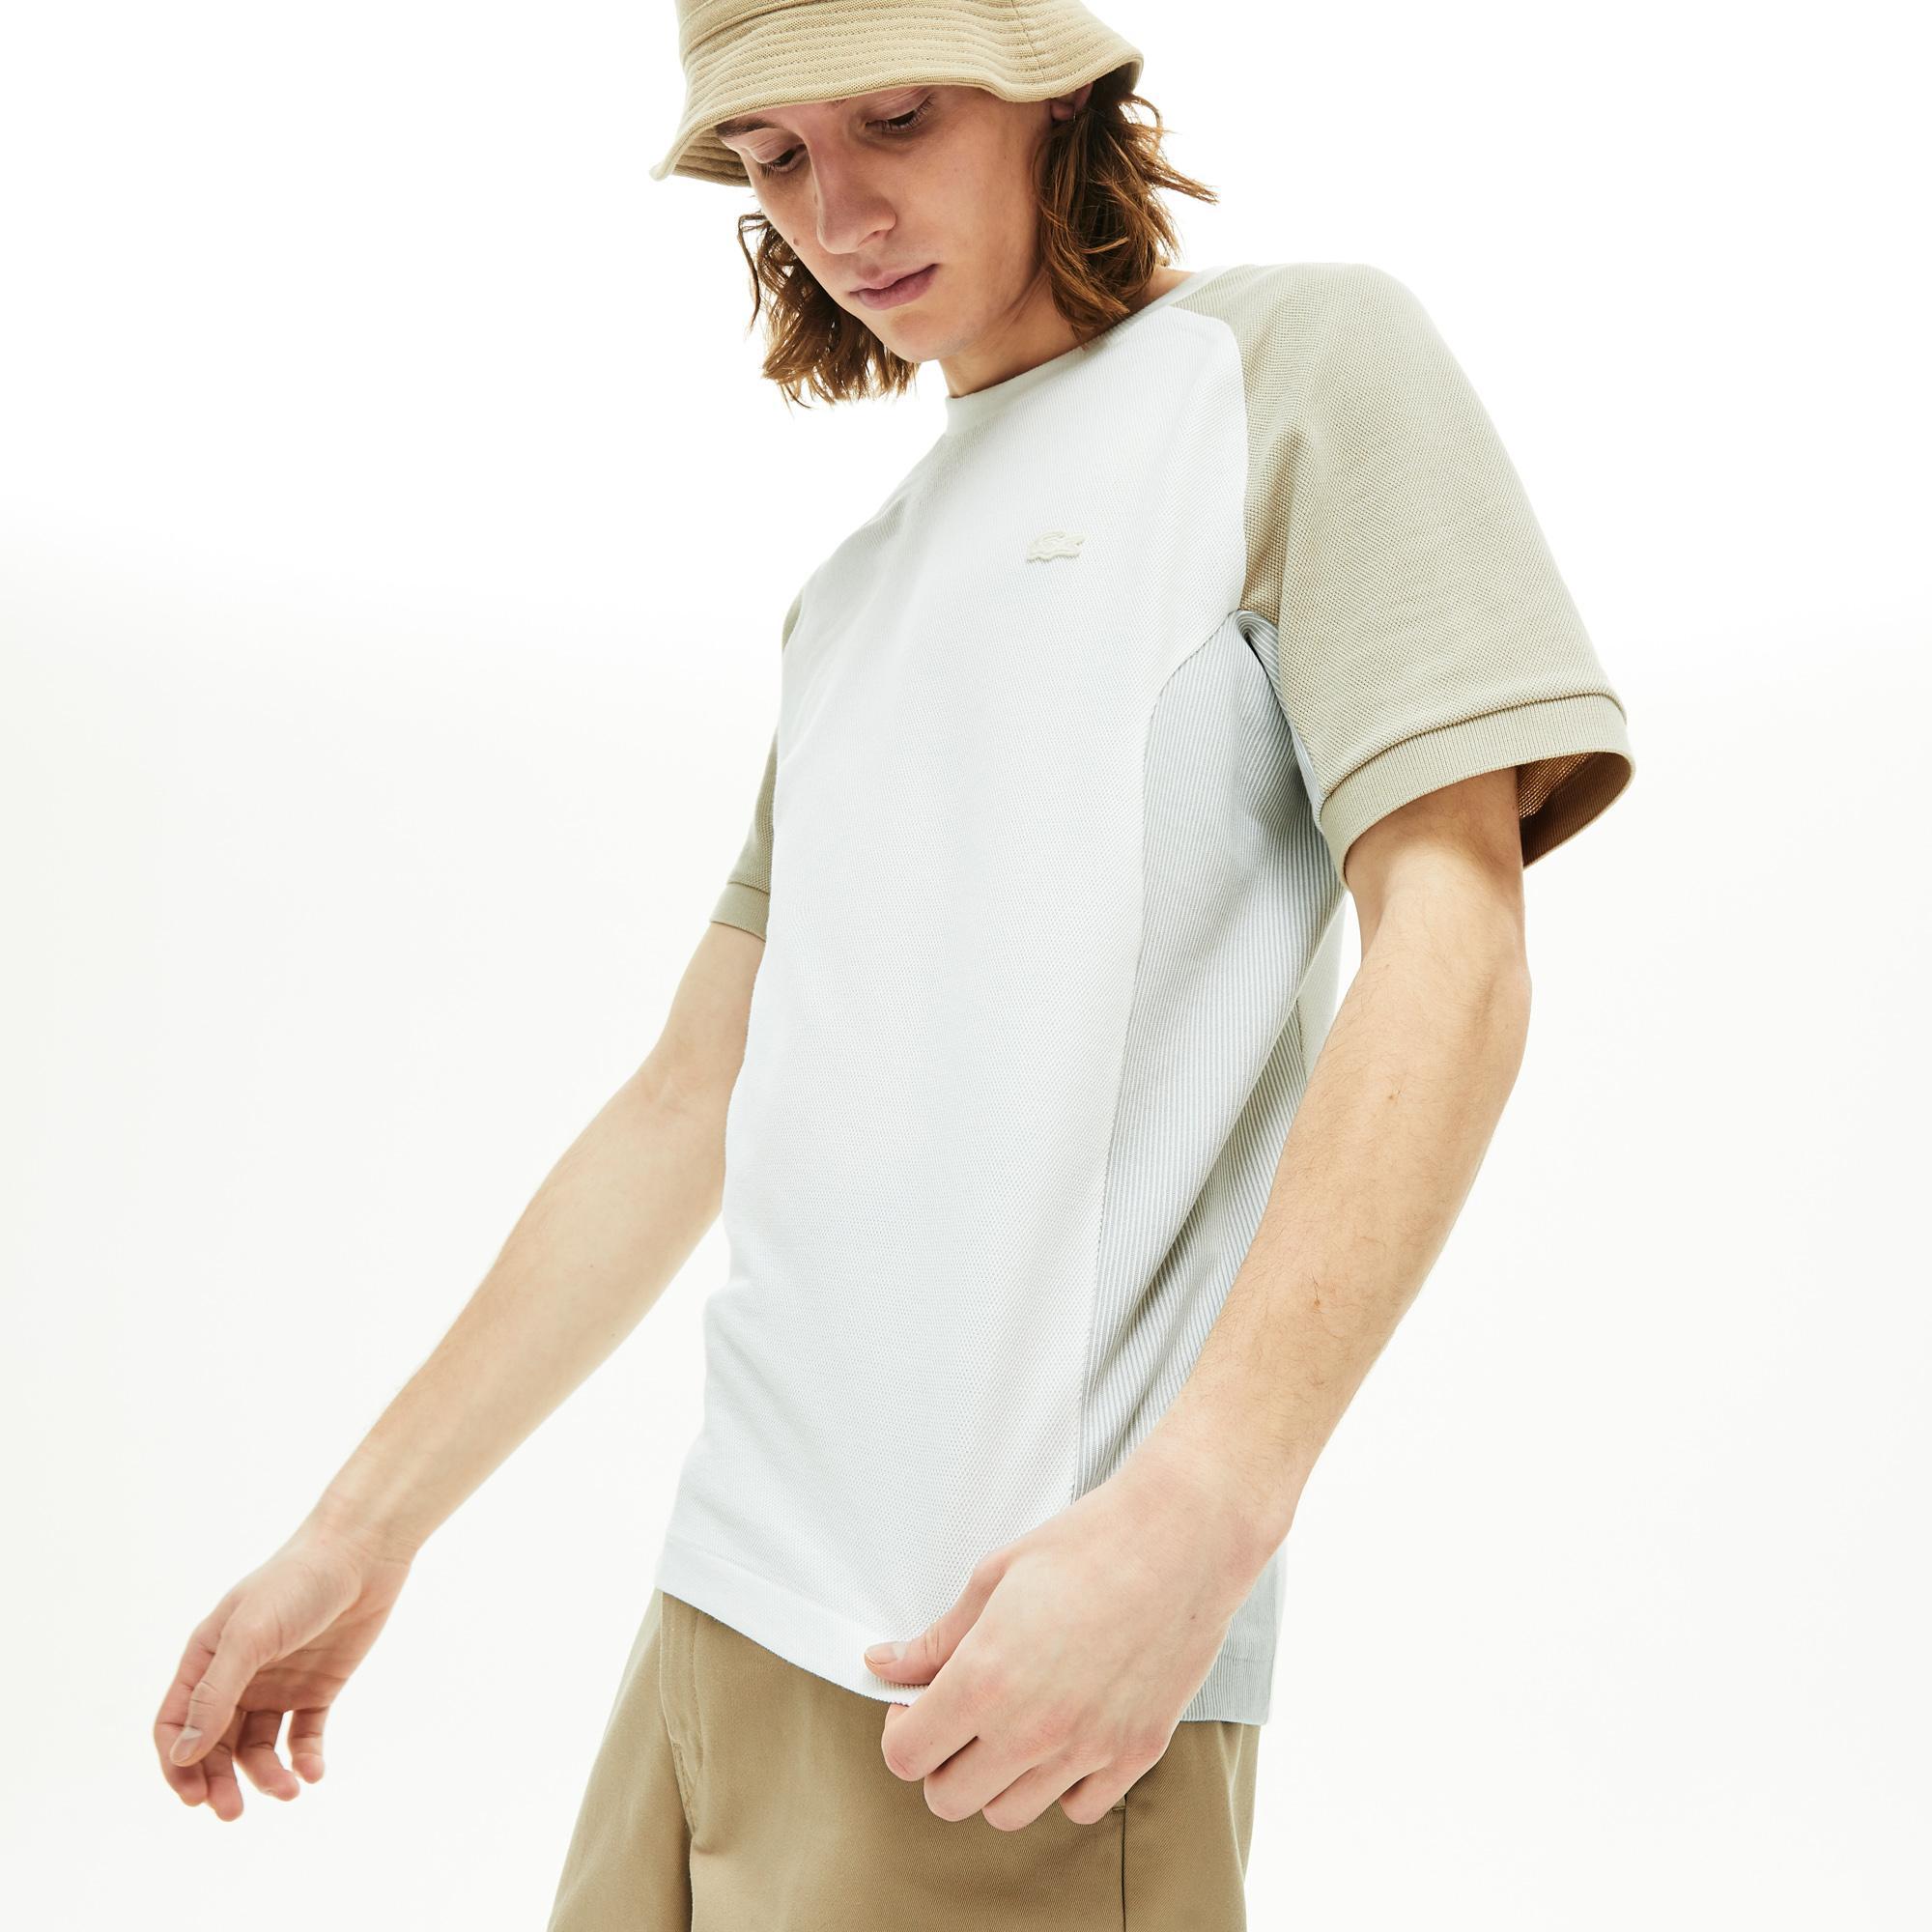 Lacoste Erkek Bisiklet Yaka Blok Desenli Beyaz T-Shirt